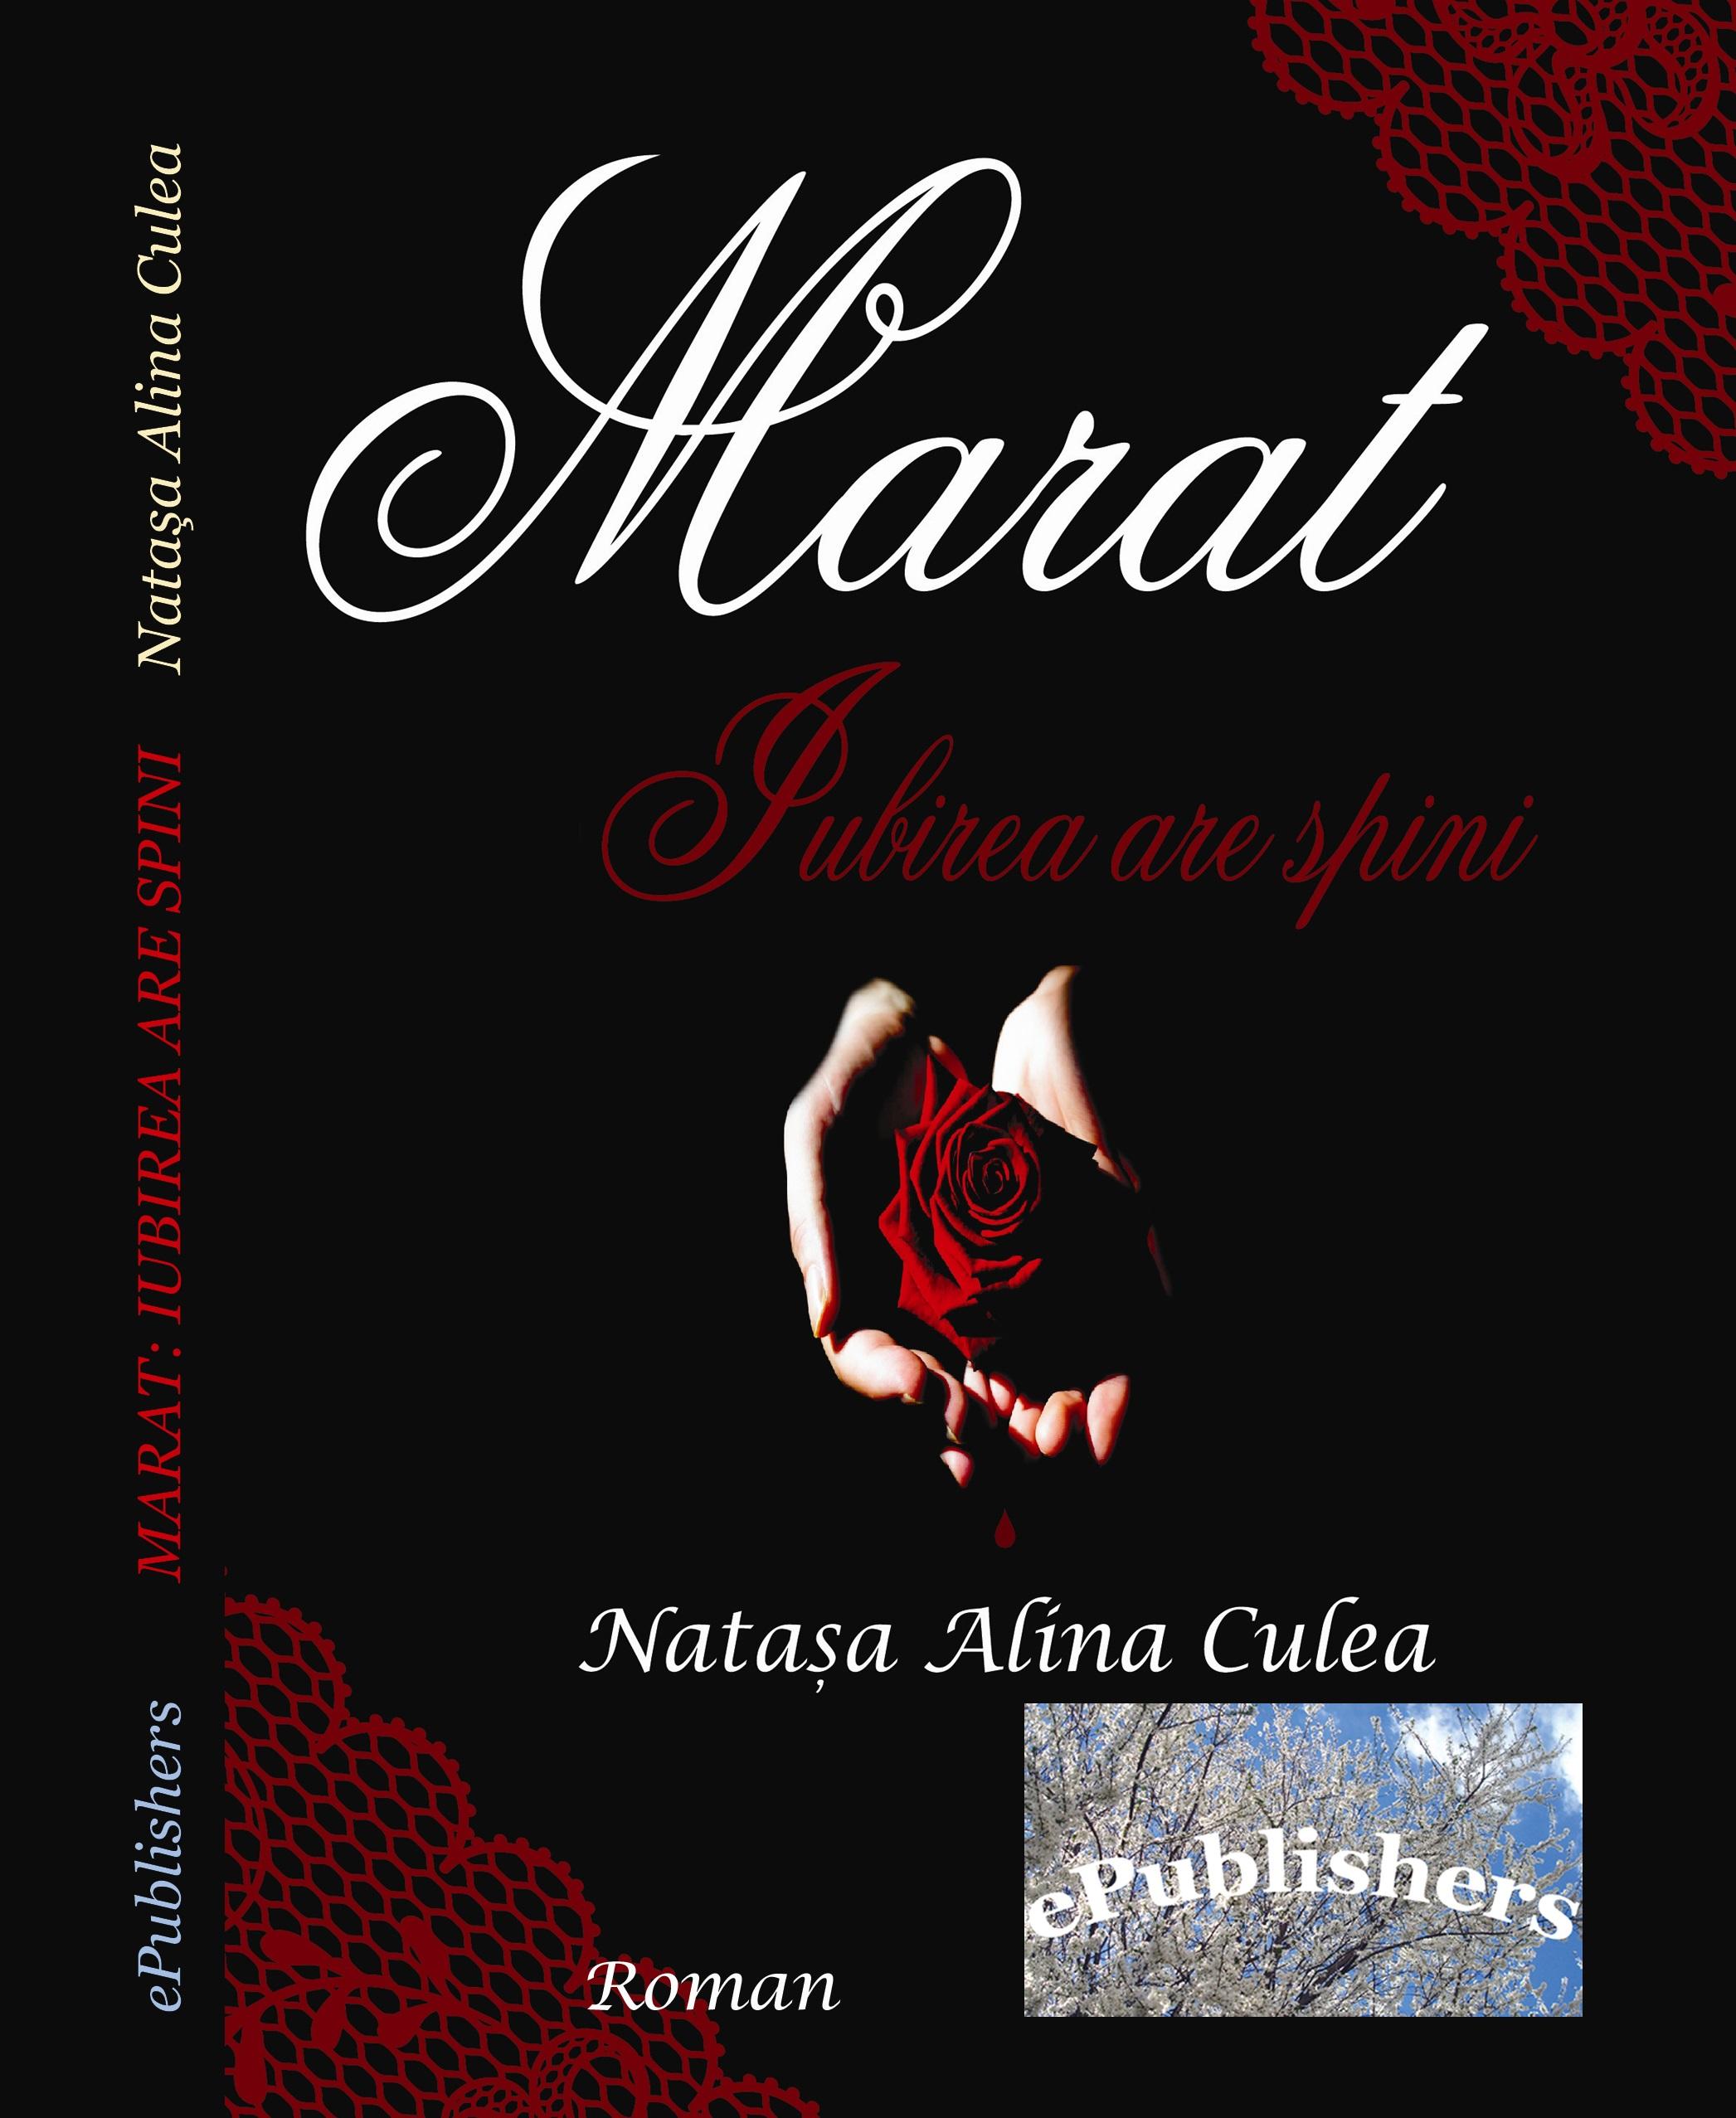 arat-iubireaarespini_roman_coverprint2015-1